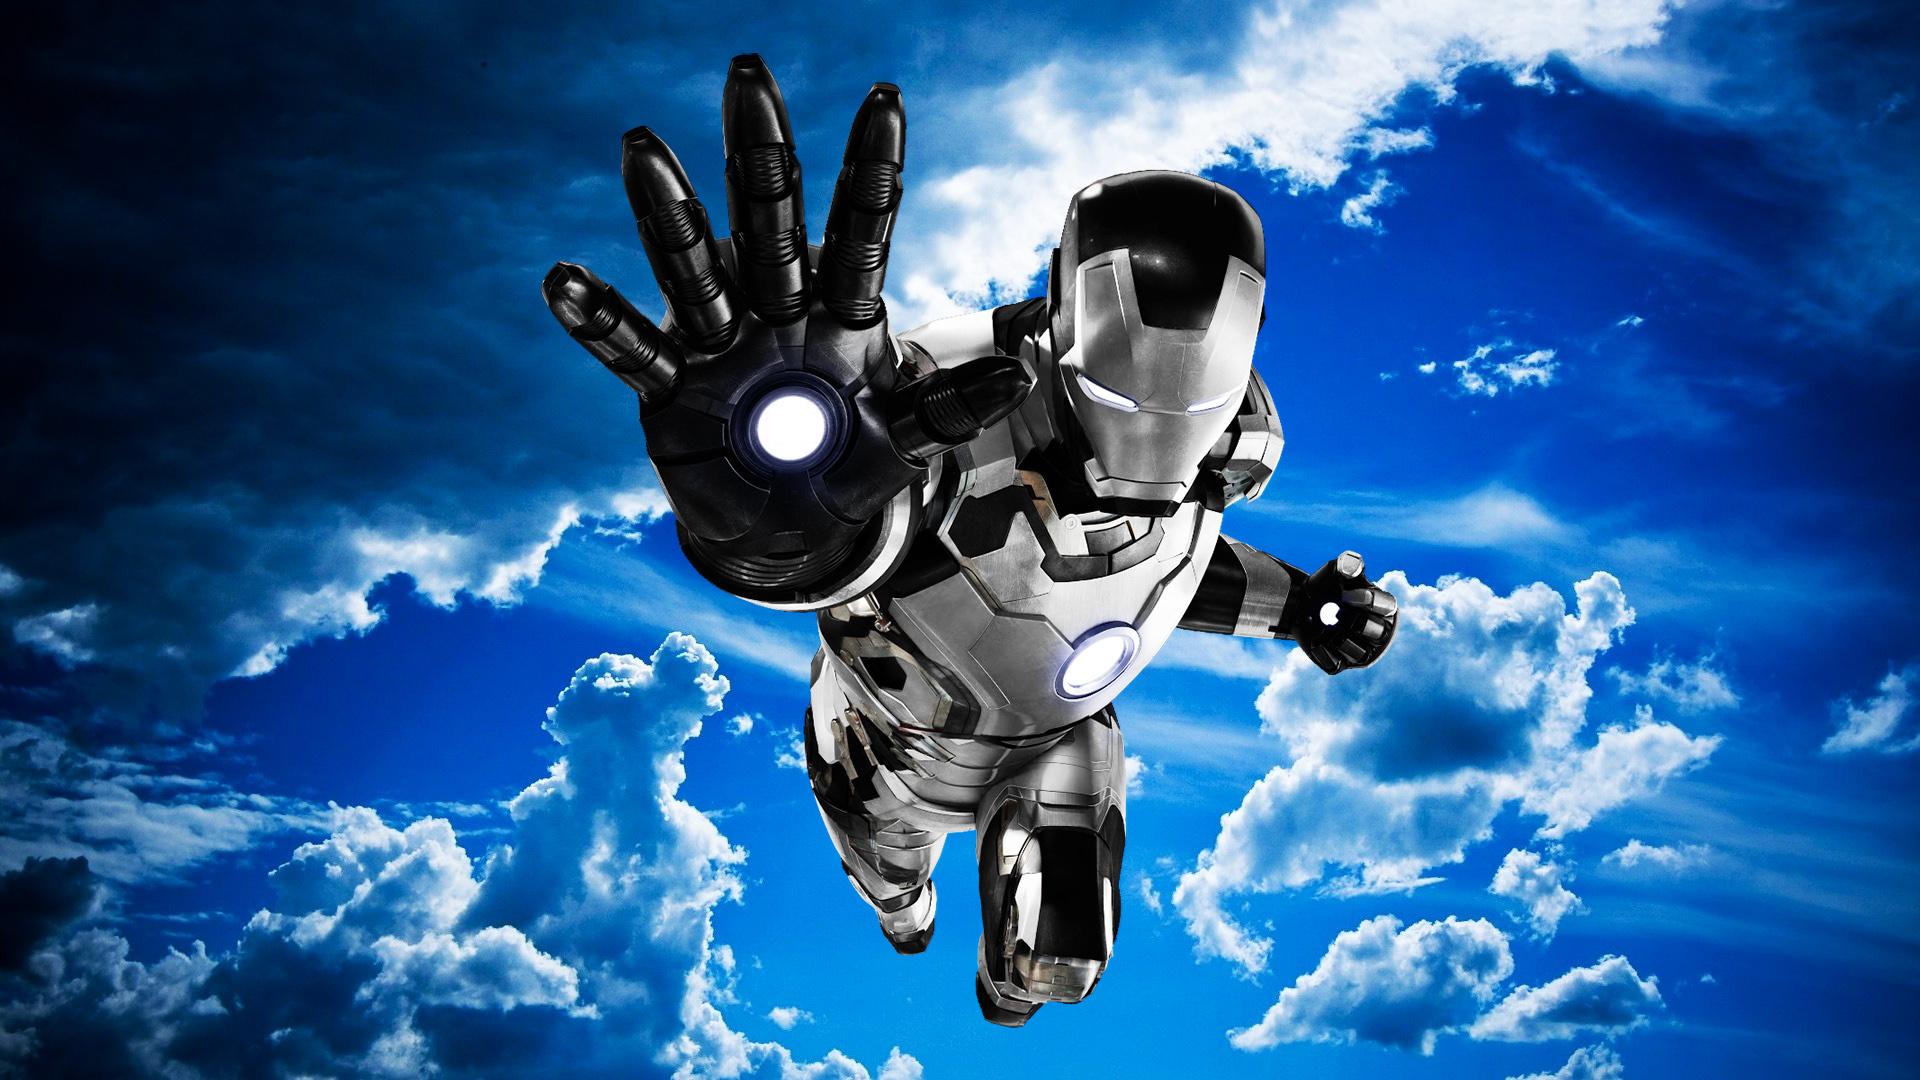 1920x1080 Iron Man Mark 42 Black And White Laptop Full Hd 1080p Hd